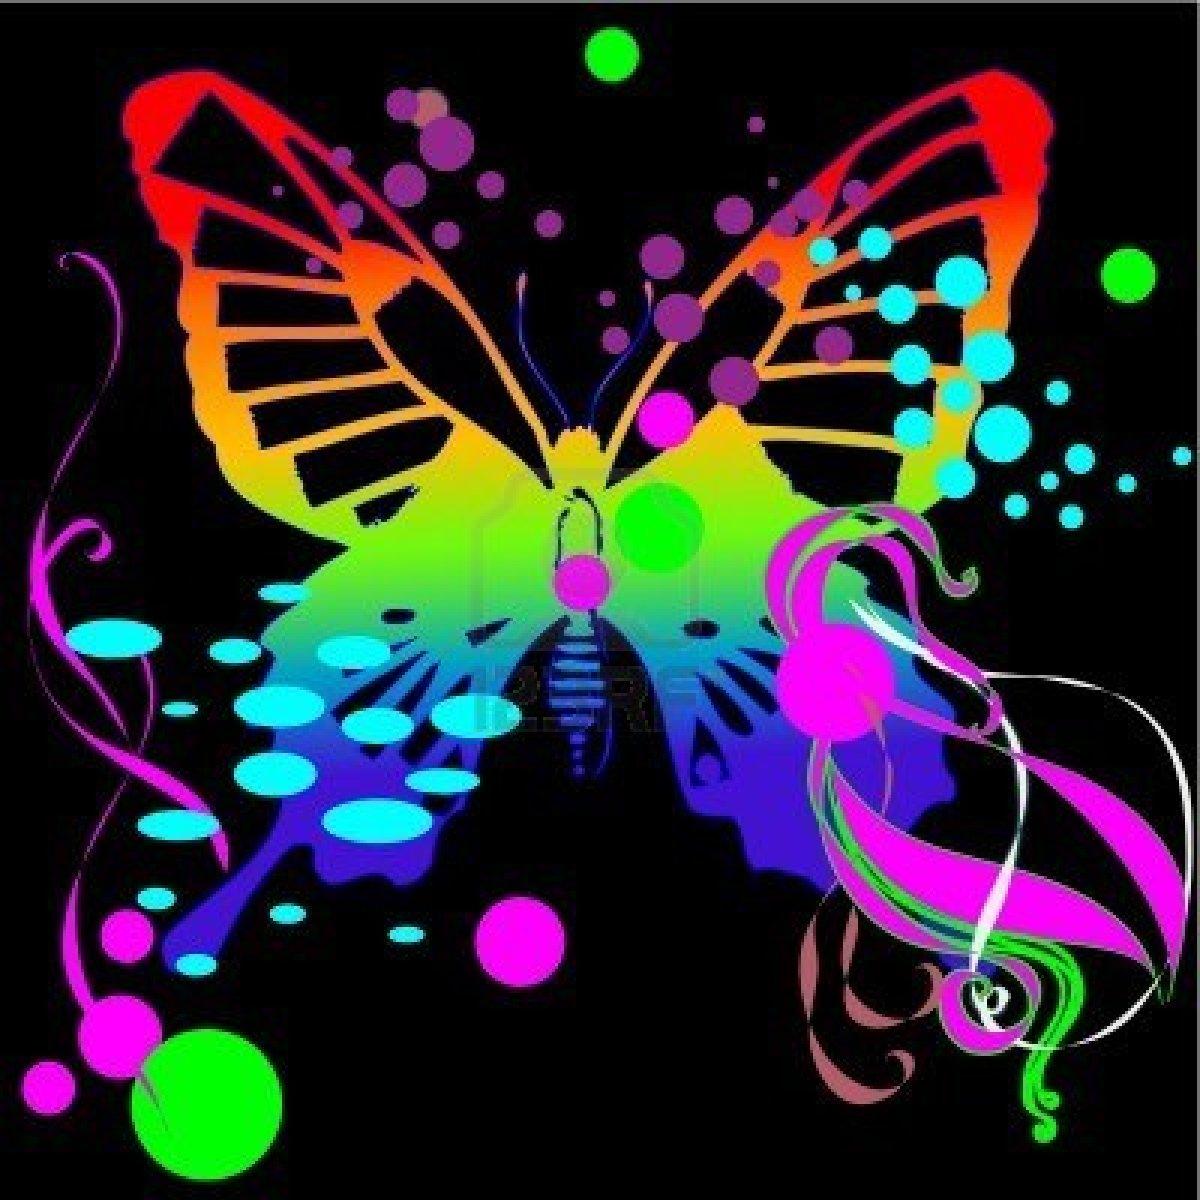 Neon Butterfly Wallpap... Neon Butterfly Wallpaper